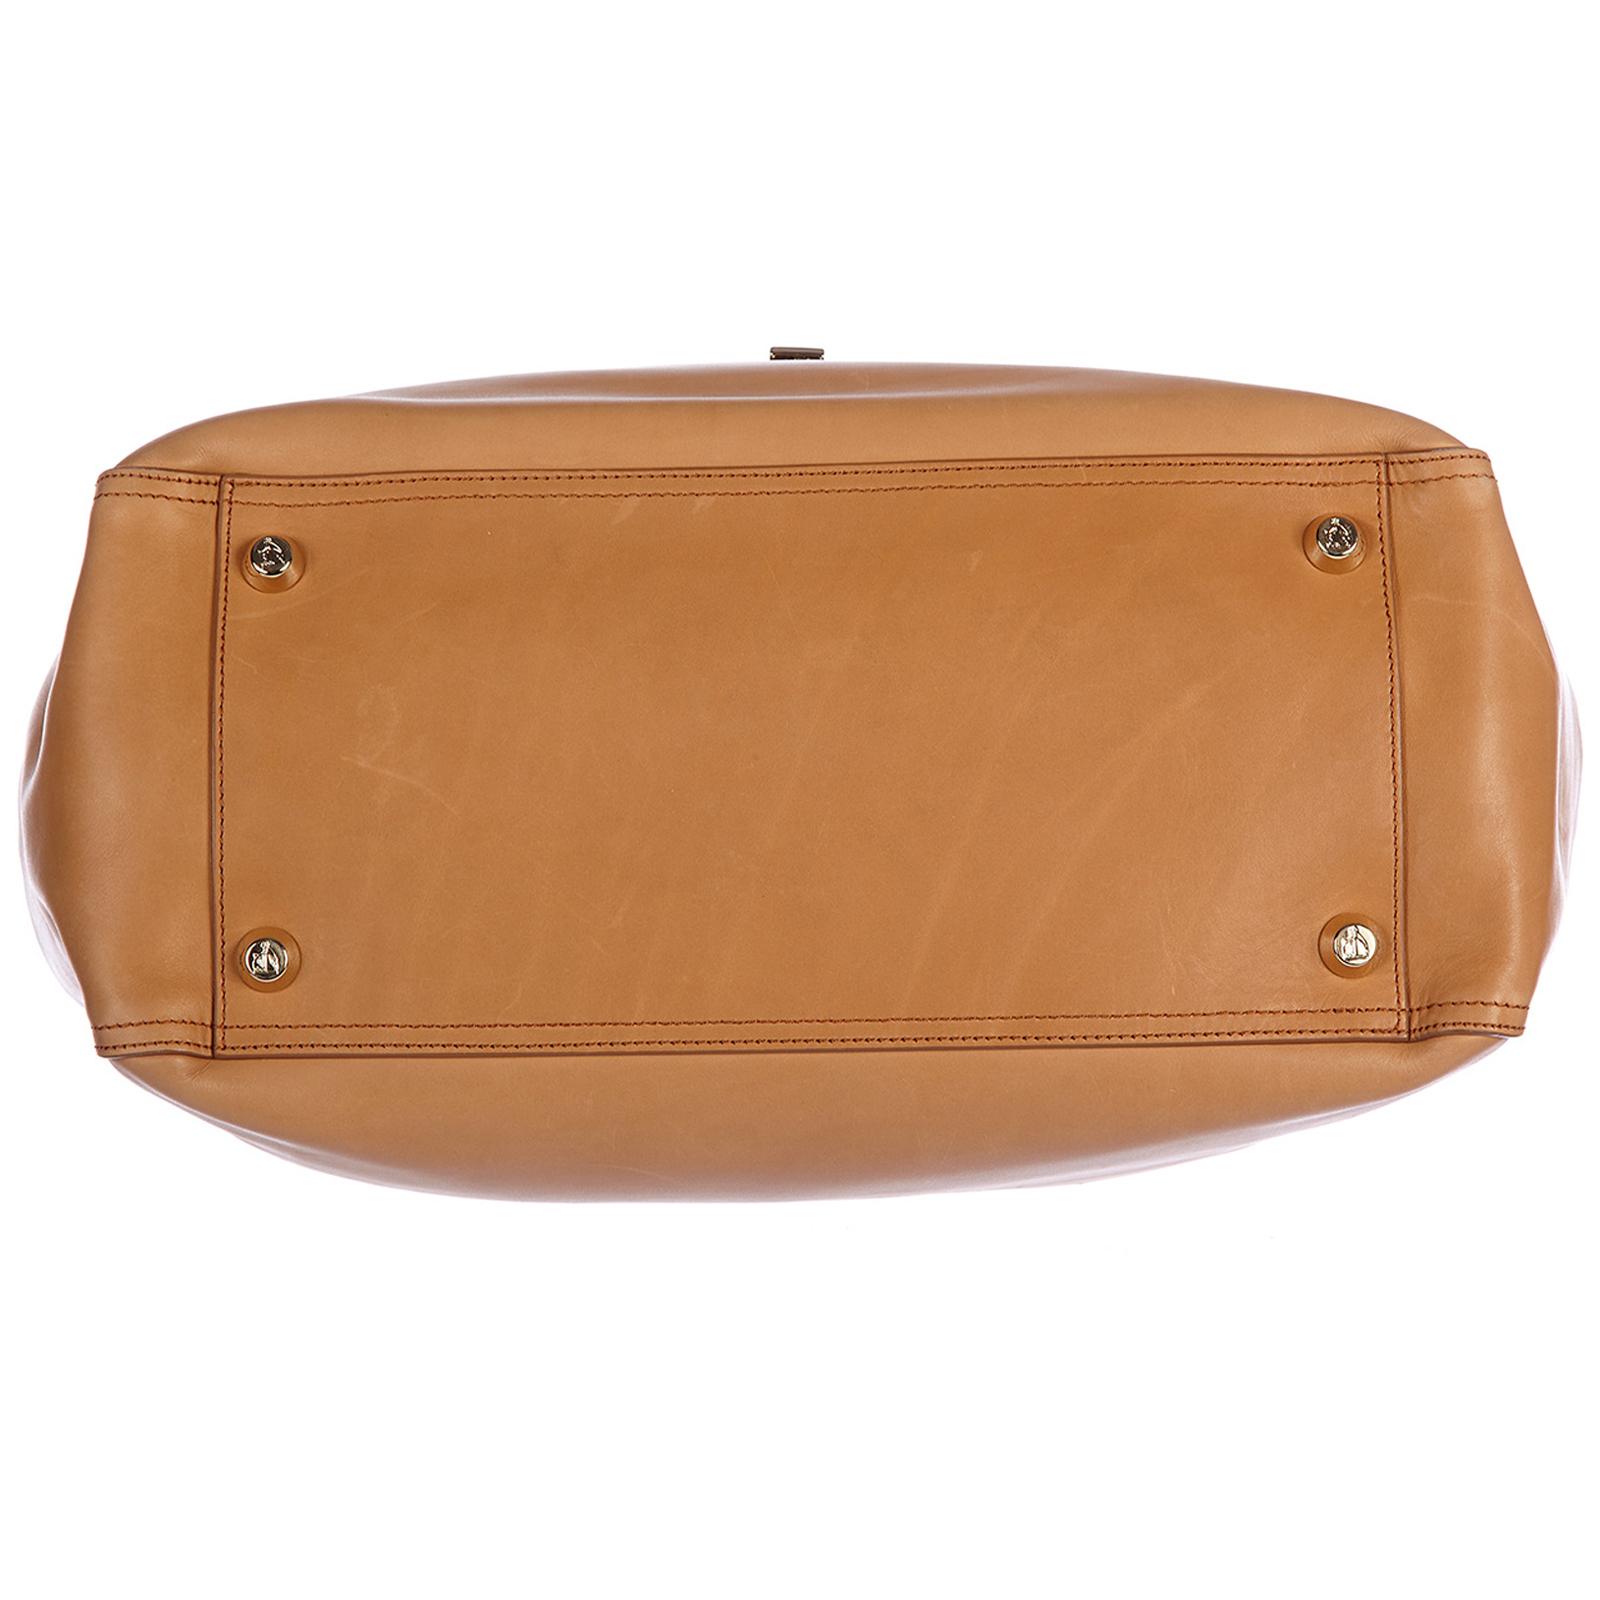 Women's leather handbag shopping bag purse bowling